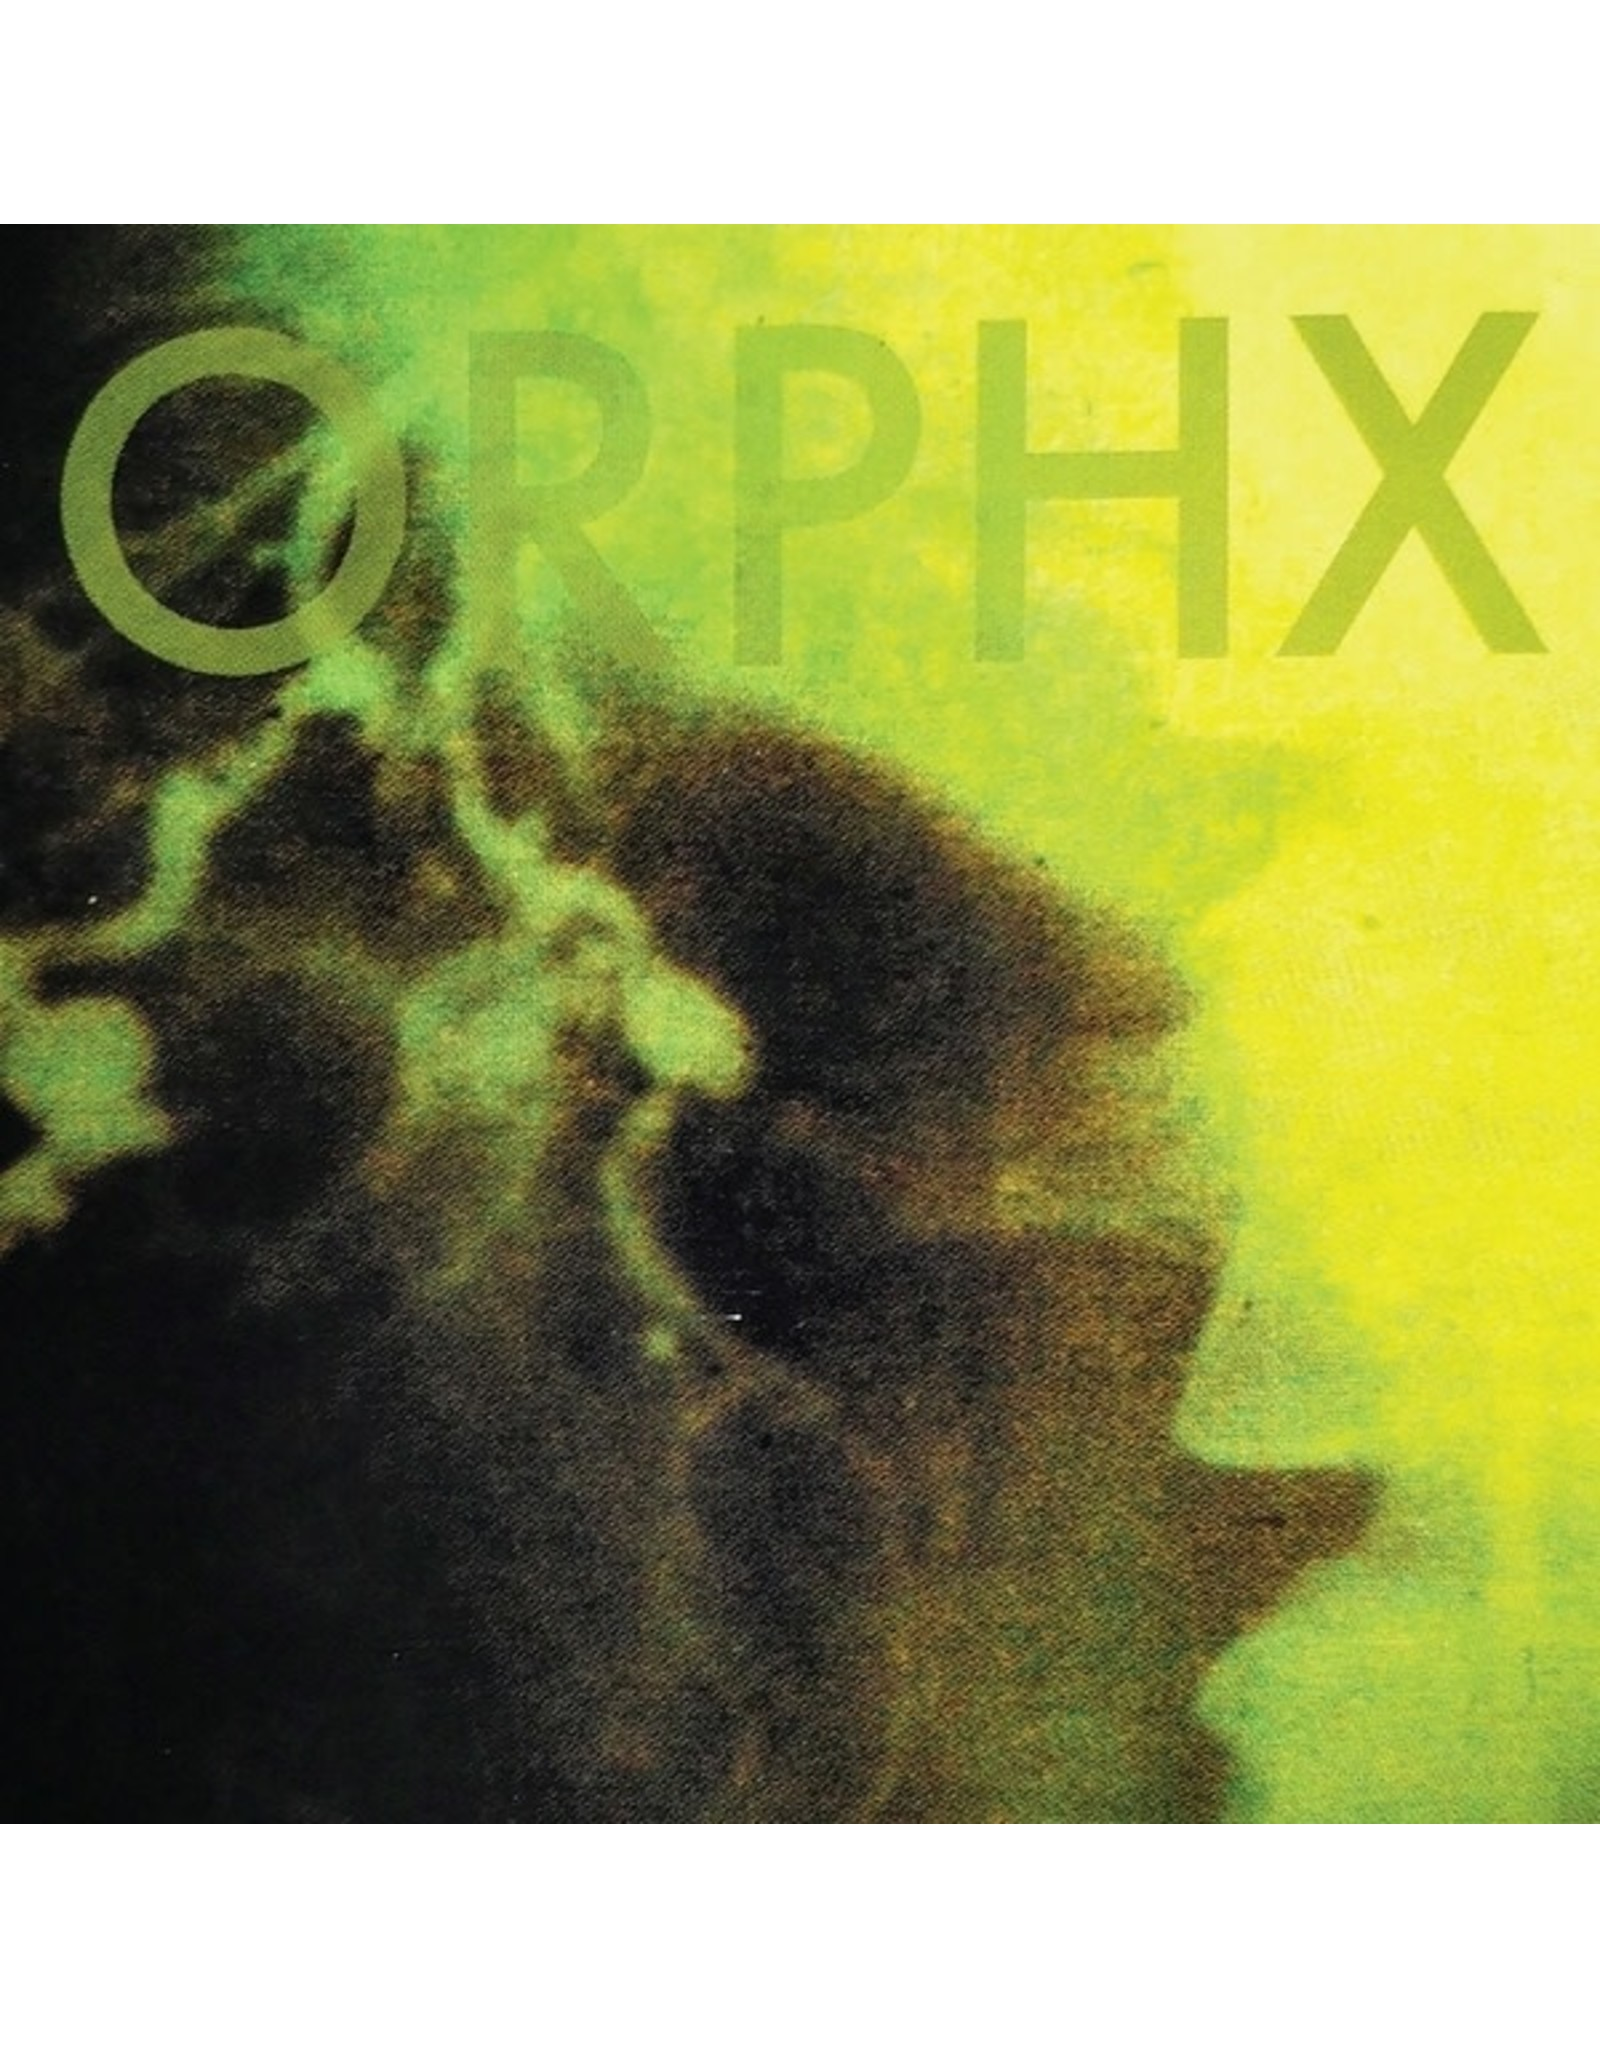 Hospital Orphx: Fragmentation 4LP